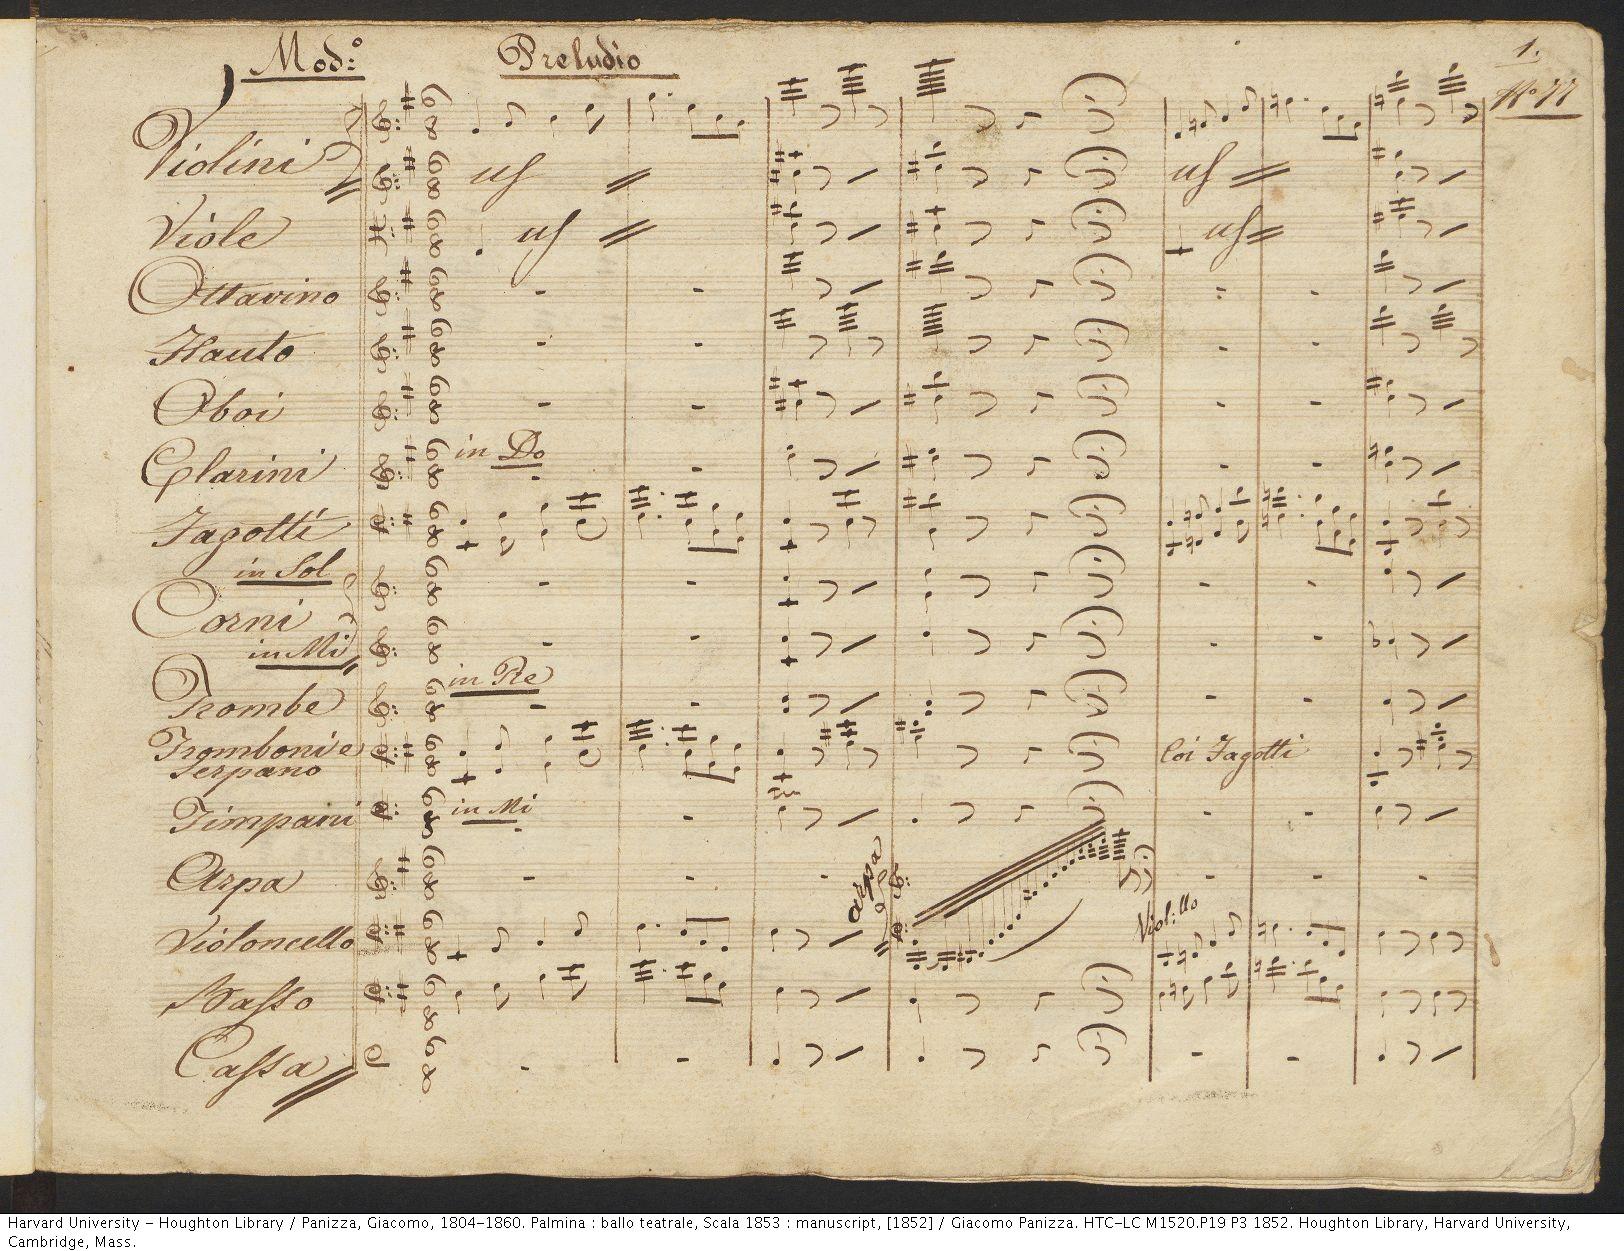 Panizza, Giacomo, 1804-1860. Palmina : ballo teatrale, Scala 1853 : manuscript, [1852] . HTC-LC M1520.P19 P3 1852